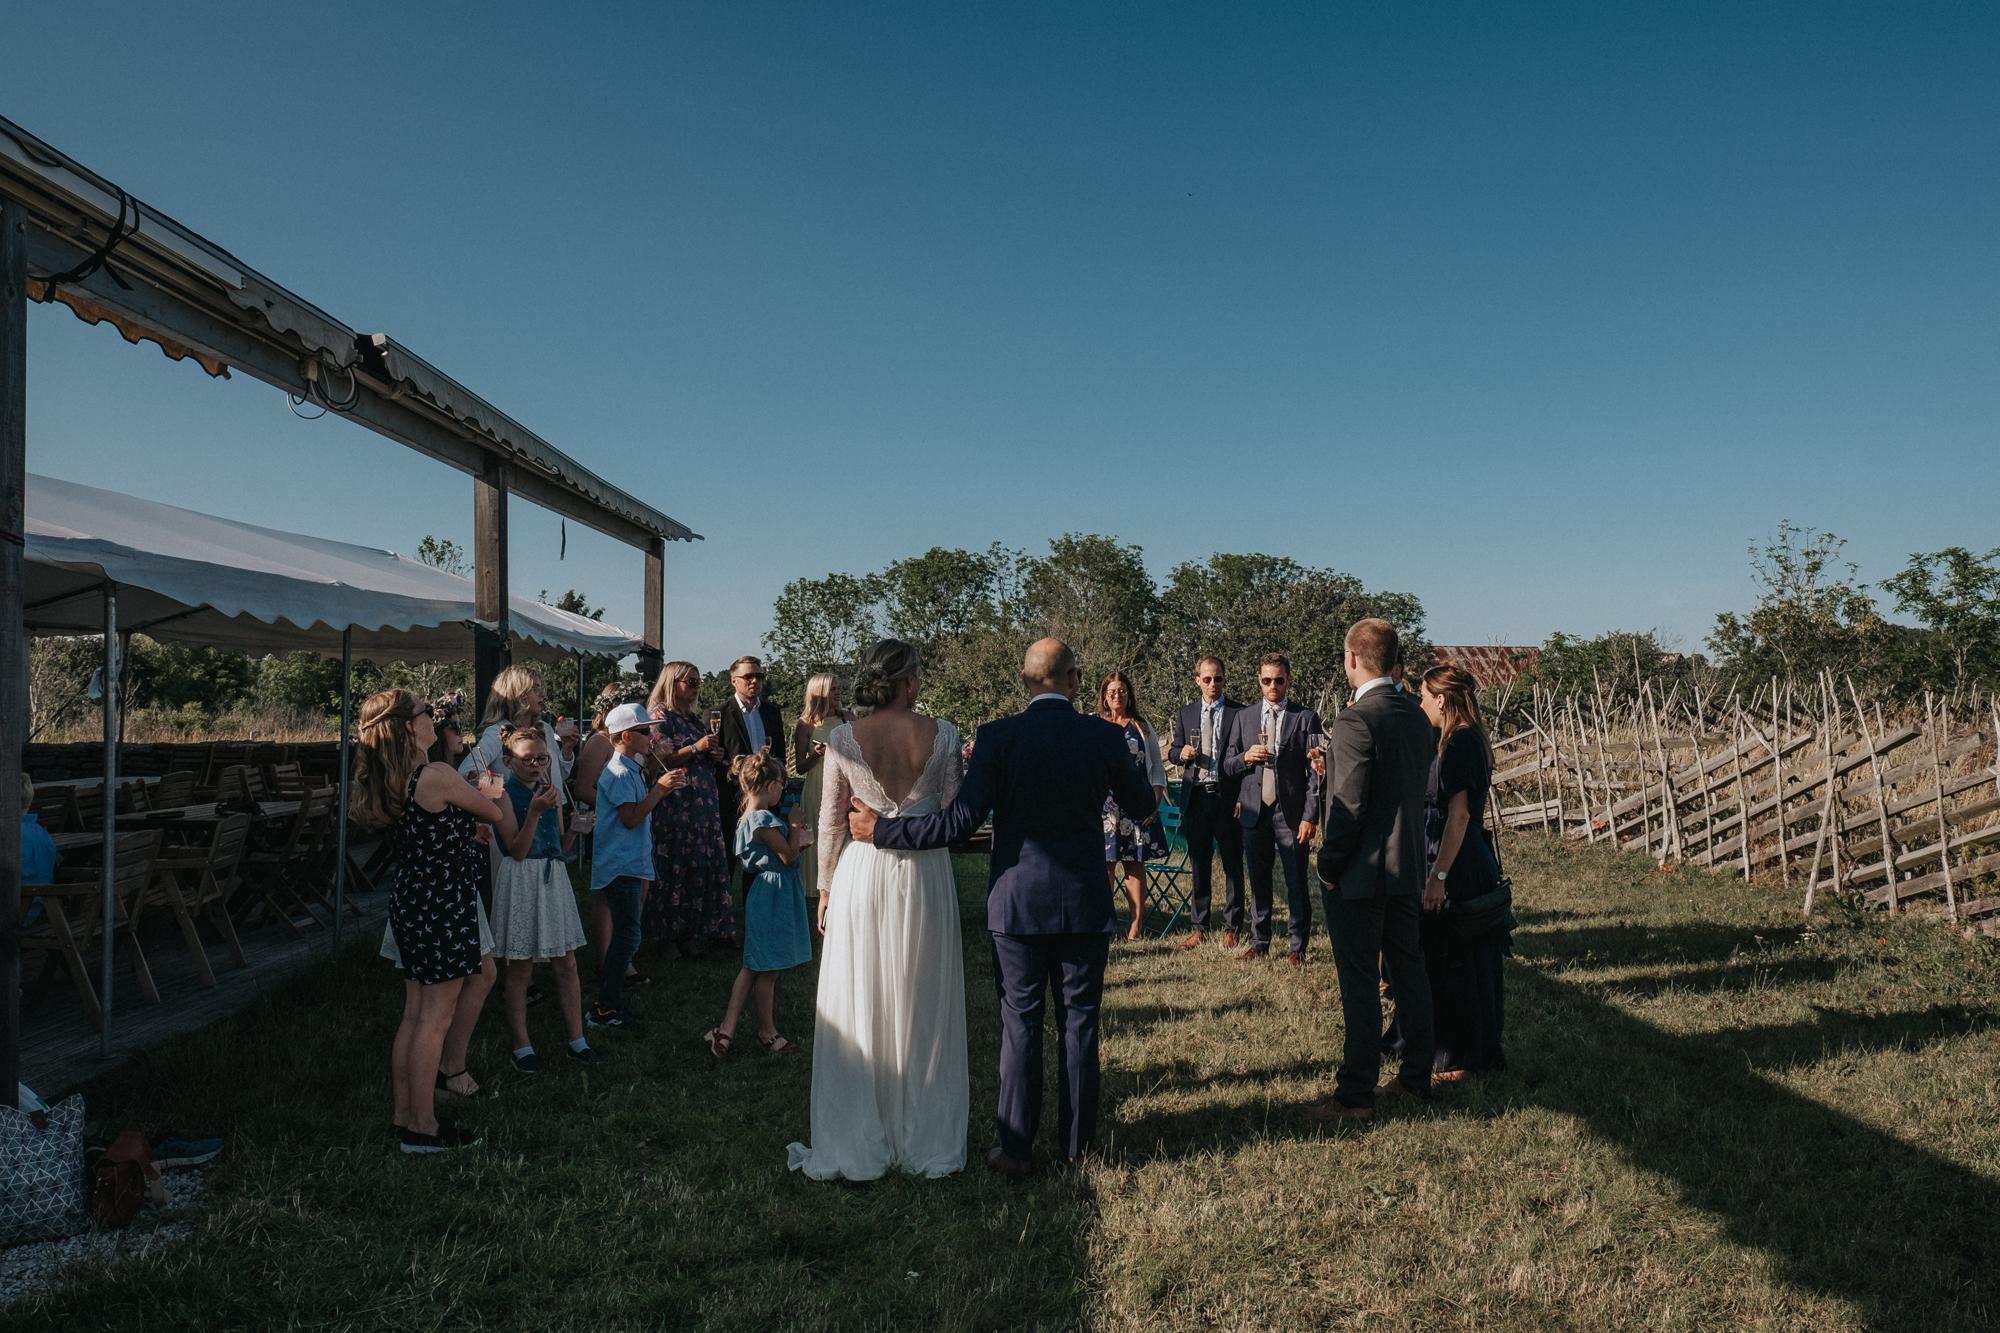 031-bröllop-fårö-neas-fotografi.jpg